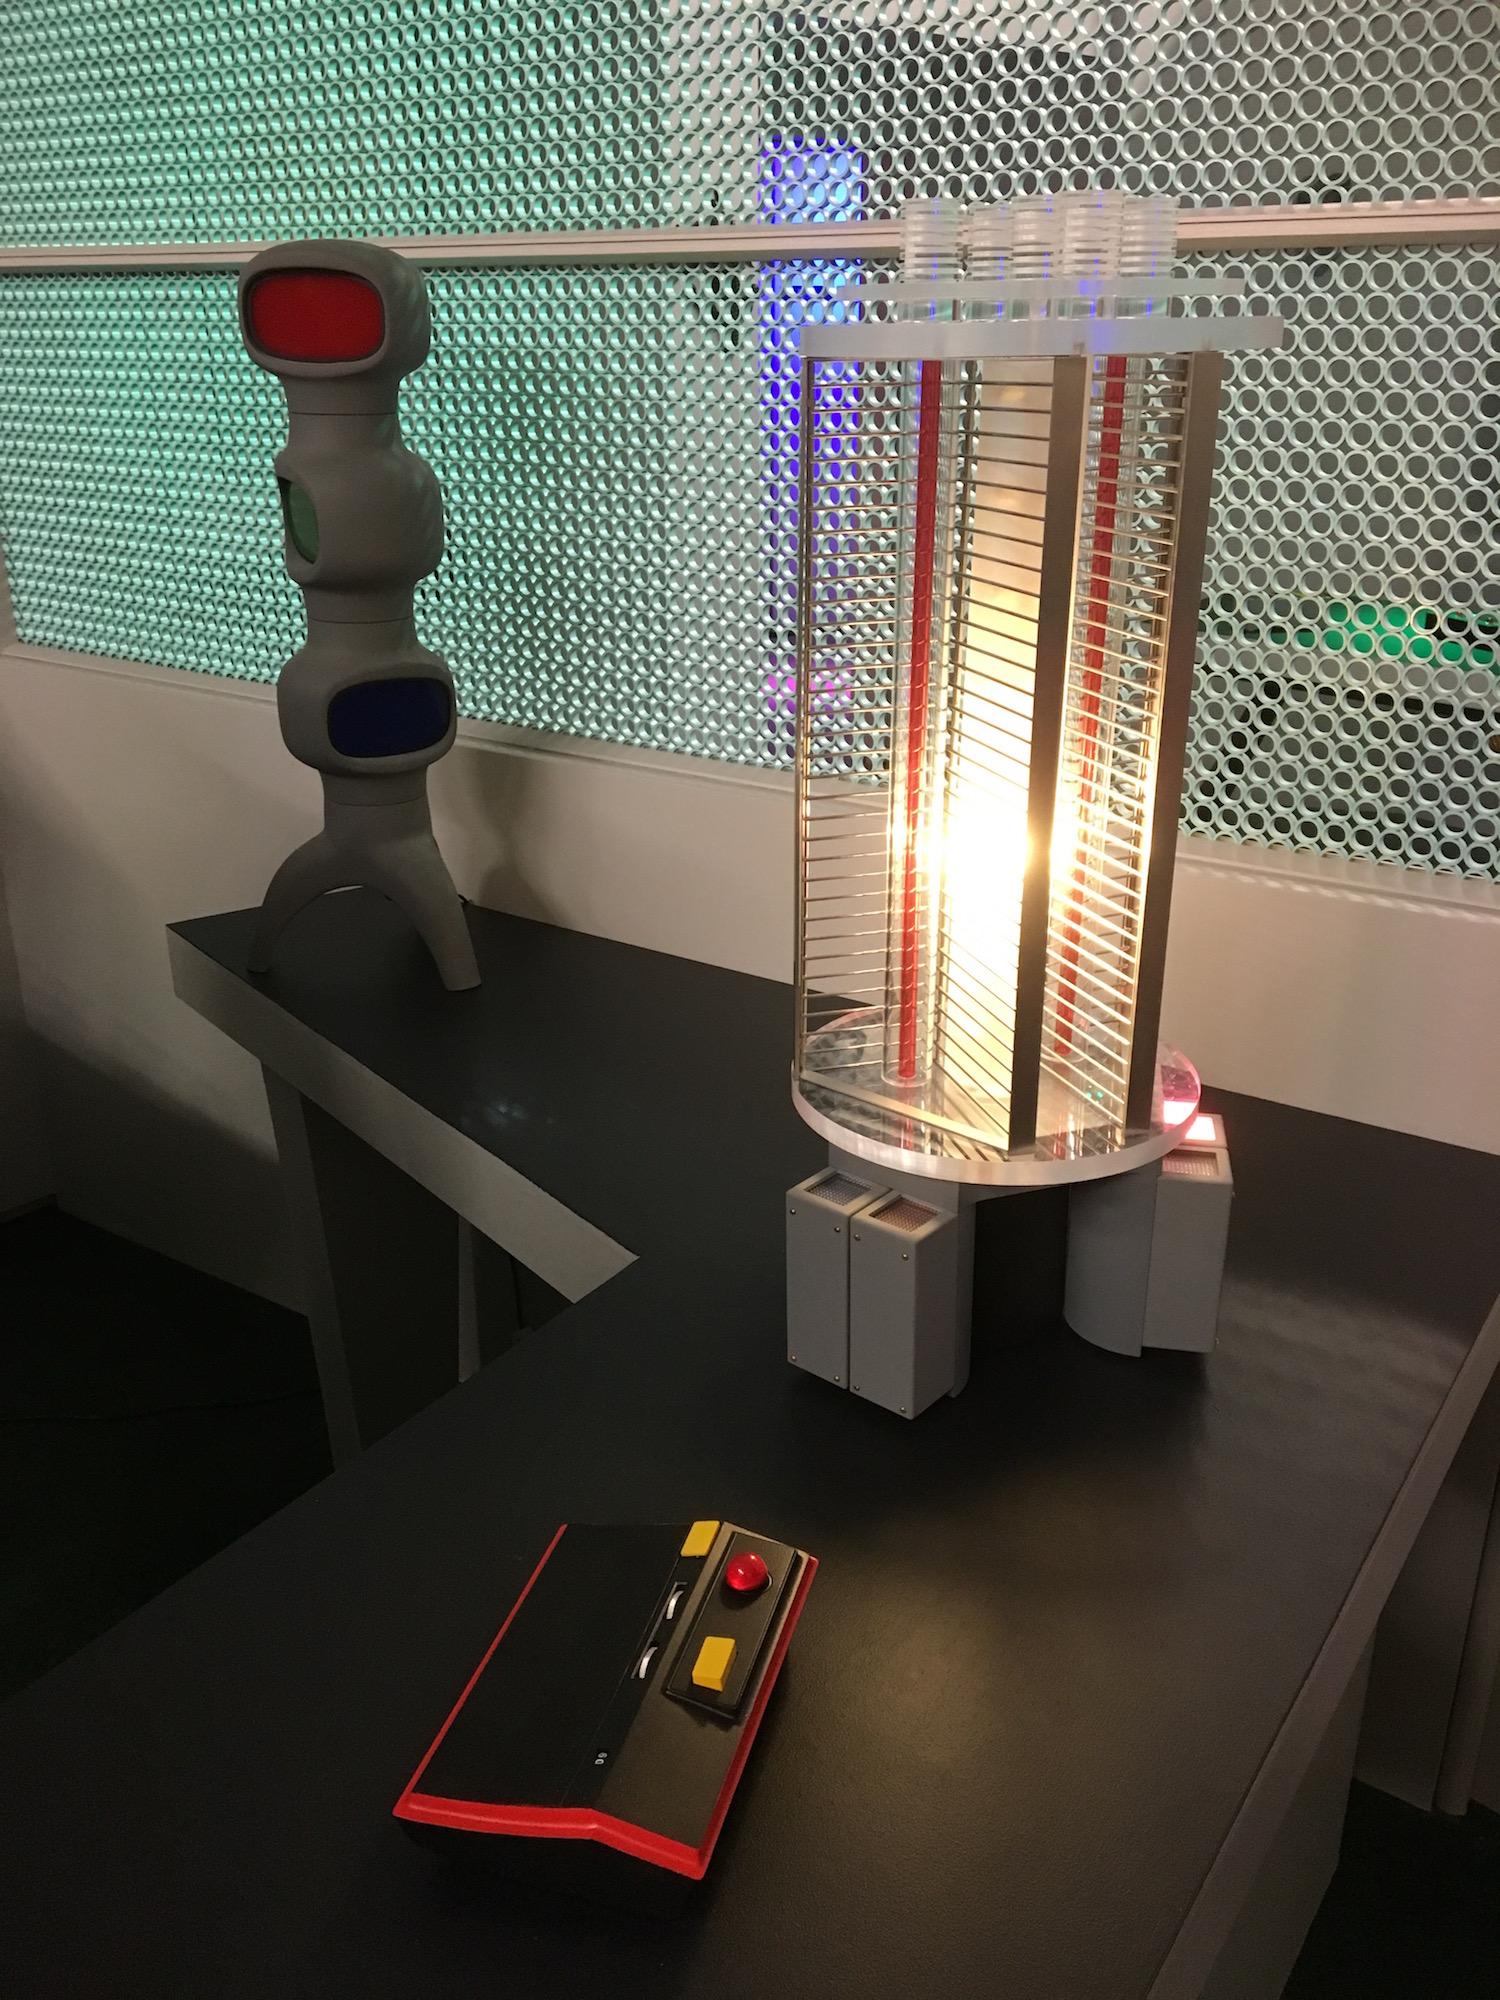 Equipment Inside Evaluation Laboratory ©2017 David R. George III